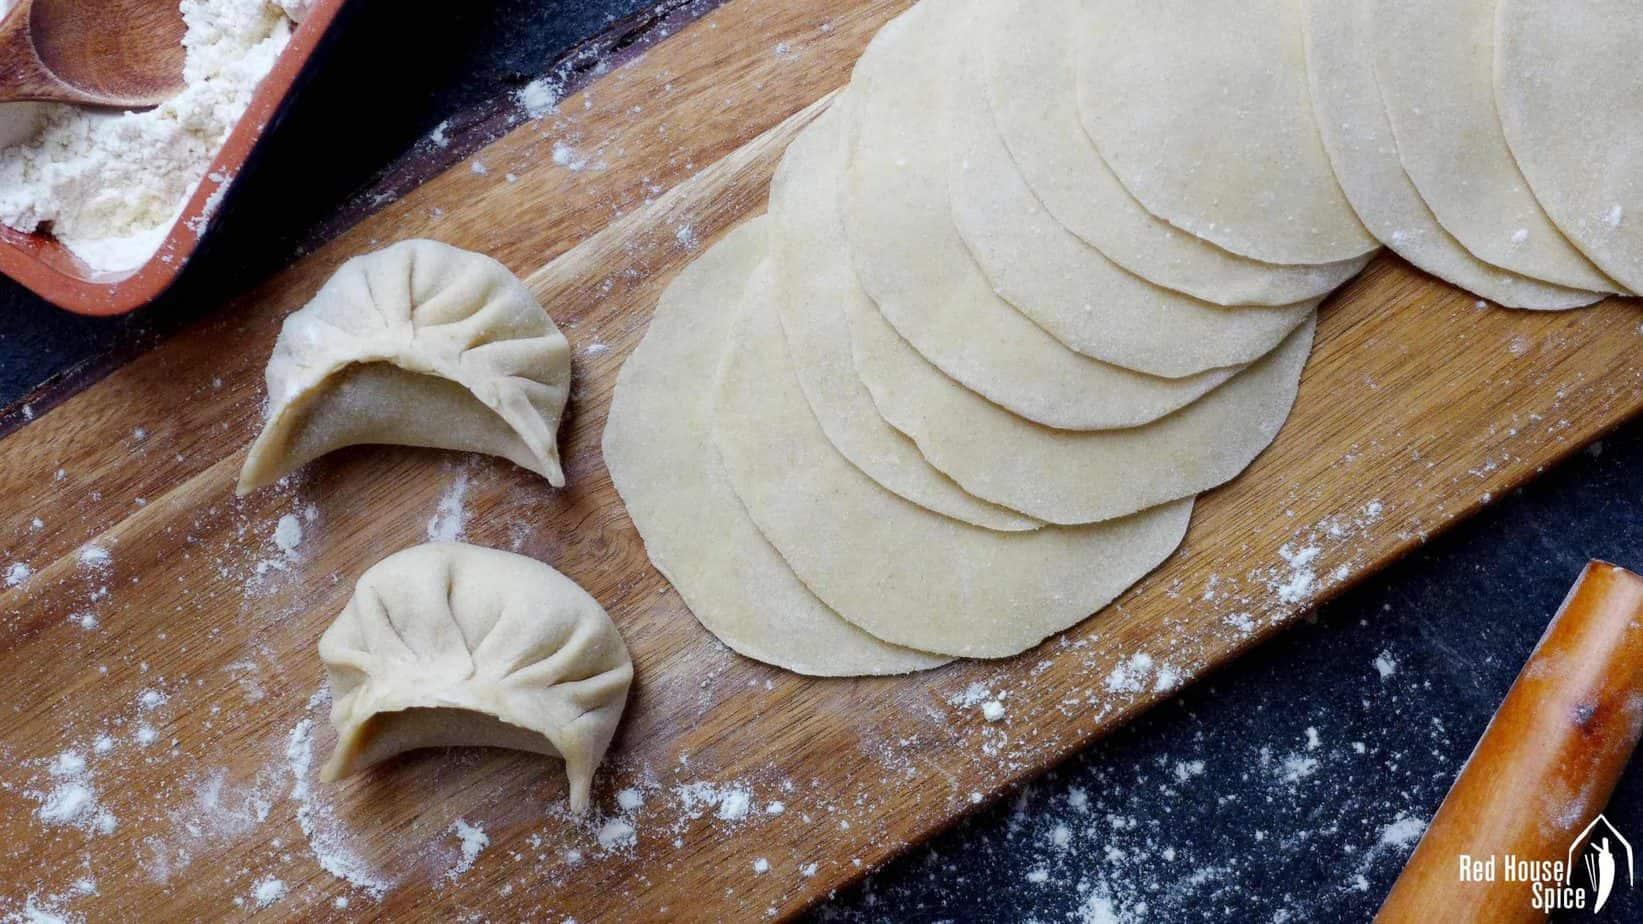 Homemade dumpling wrappers with 2 dumplings.